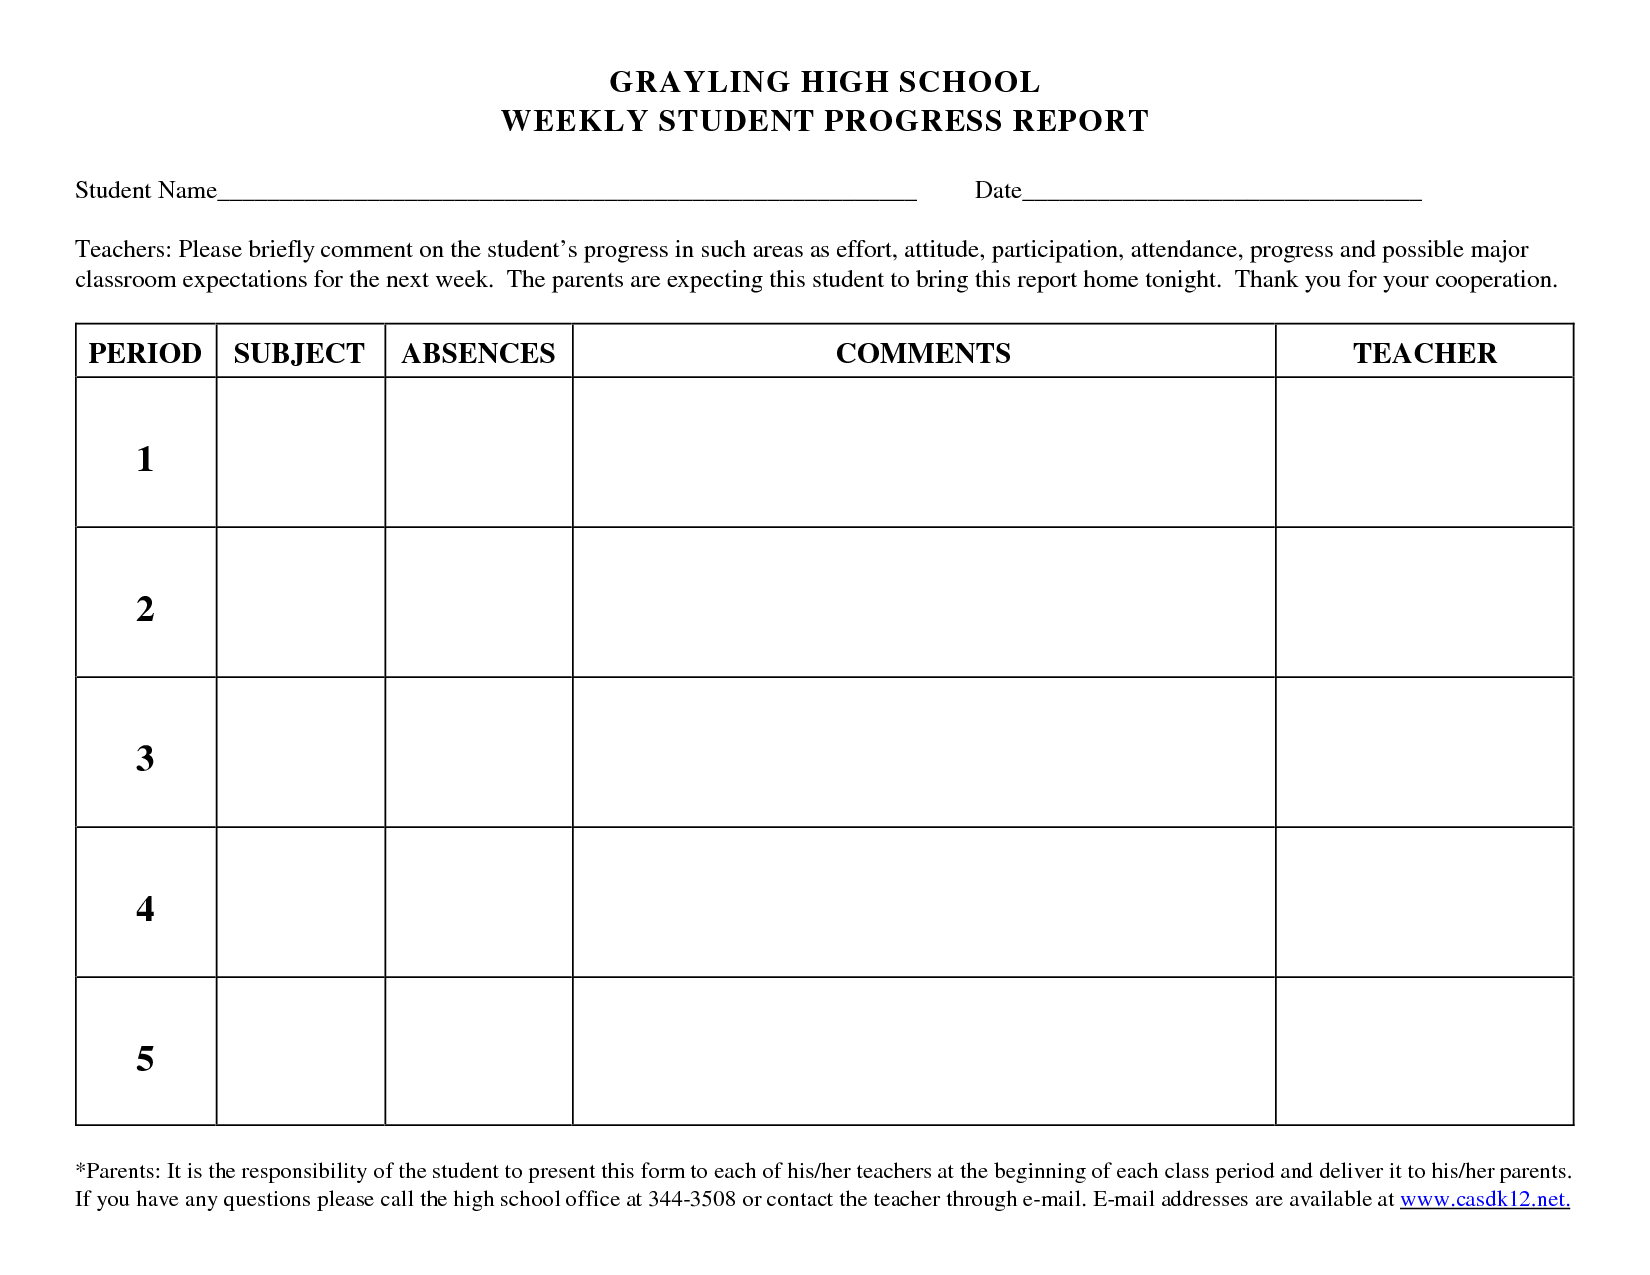 020 Template Ideas Student Progress Report School 412698 With Regard To School Progress Report Template